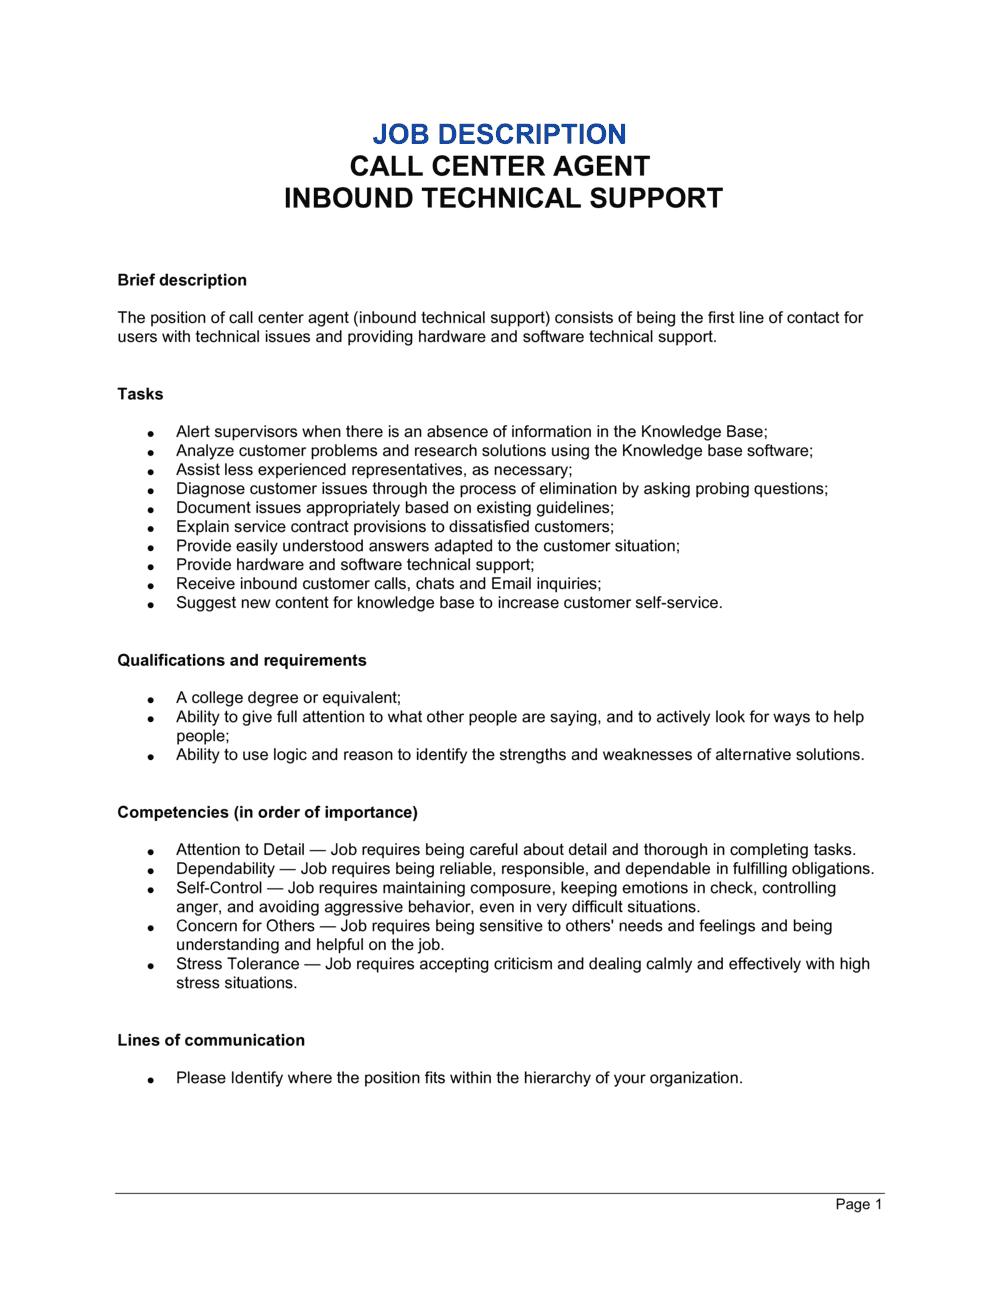 Business-in-a-Box's Call Center Agent_Inbound_Technical Support Job Description Template